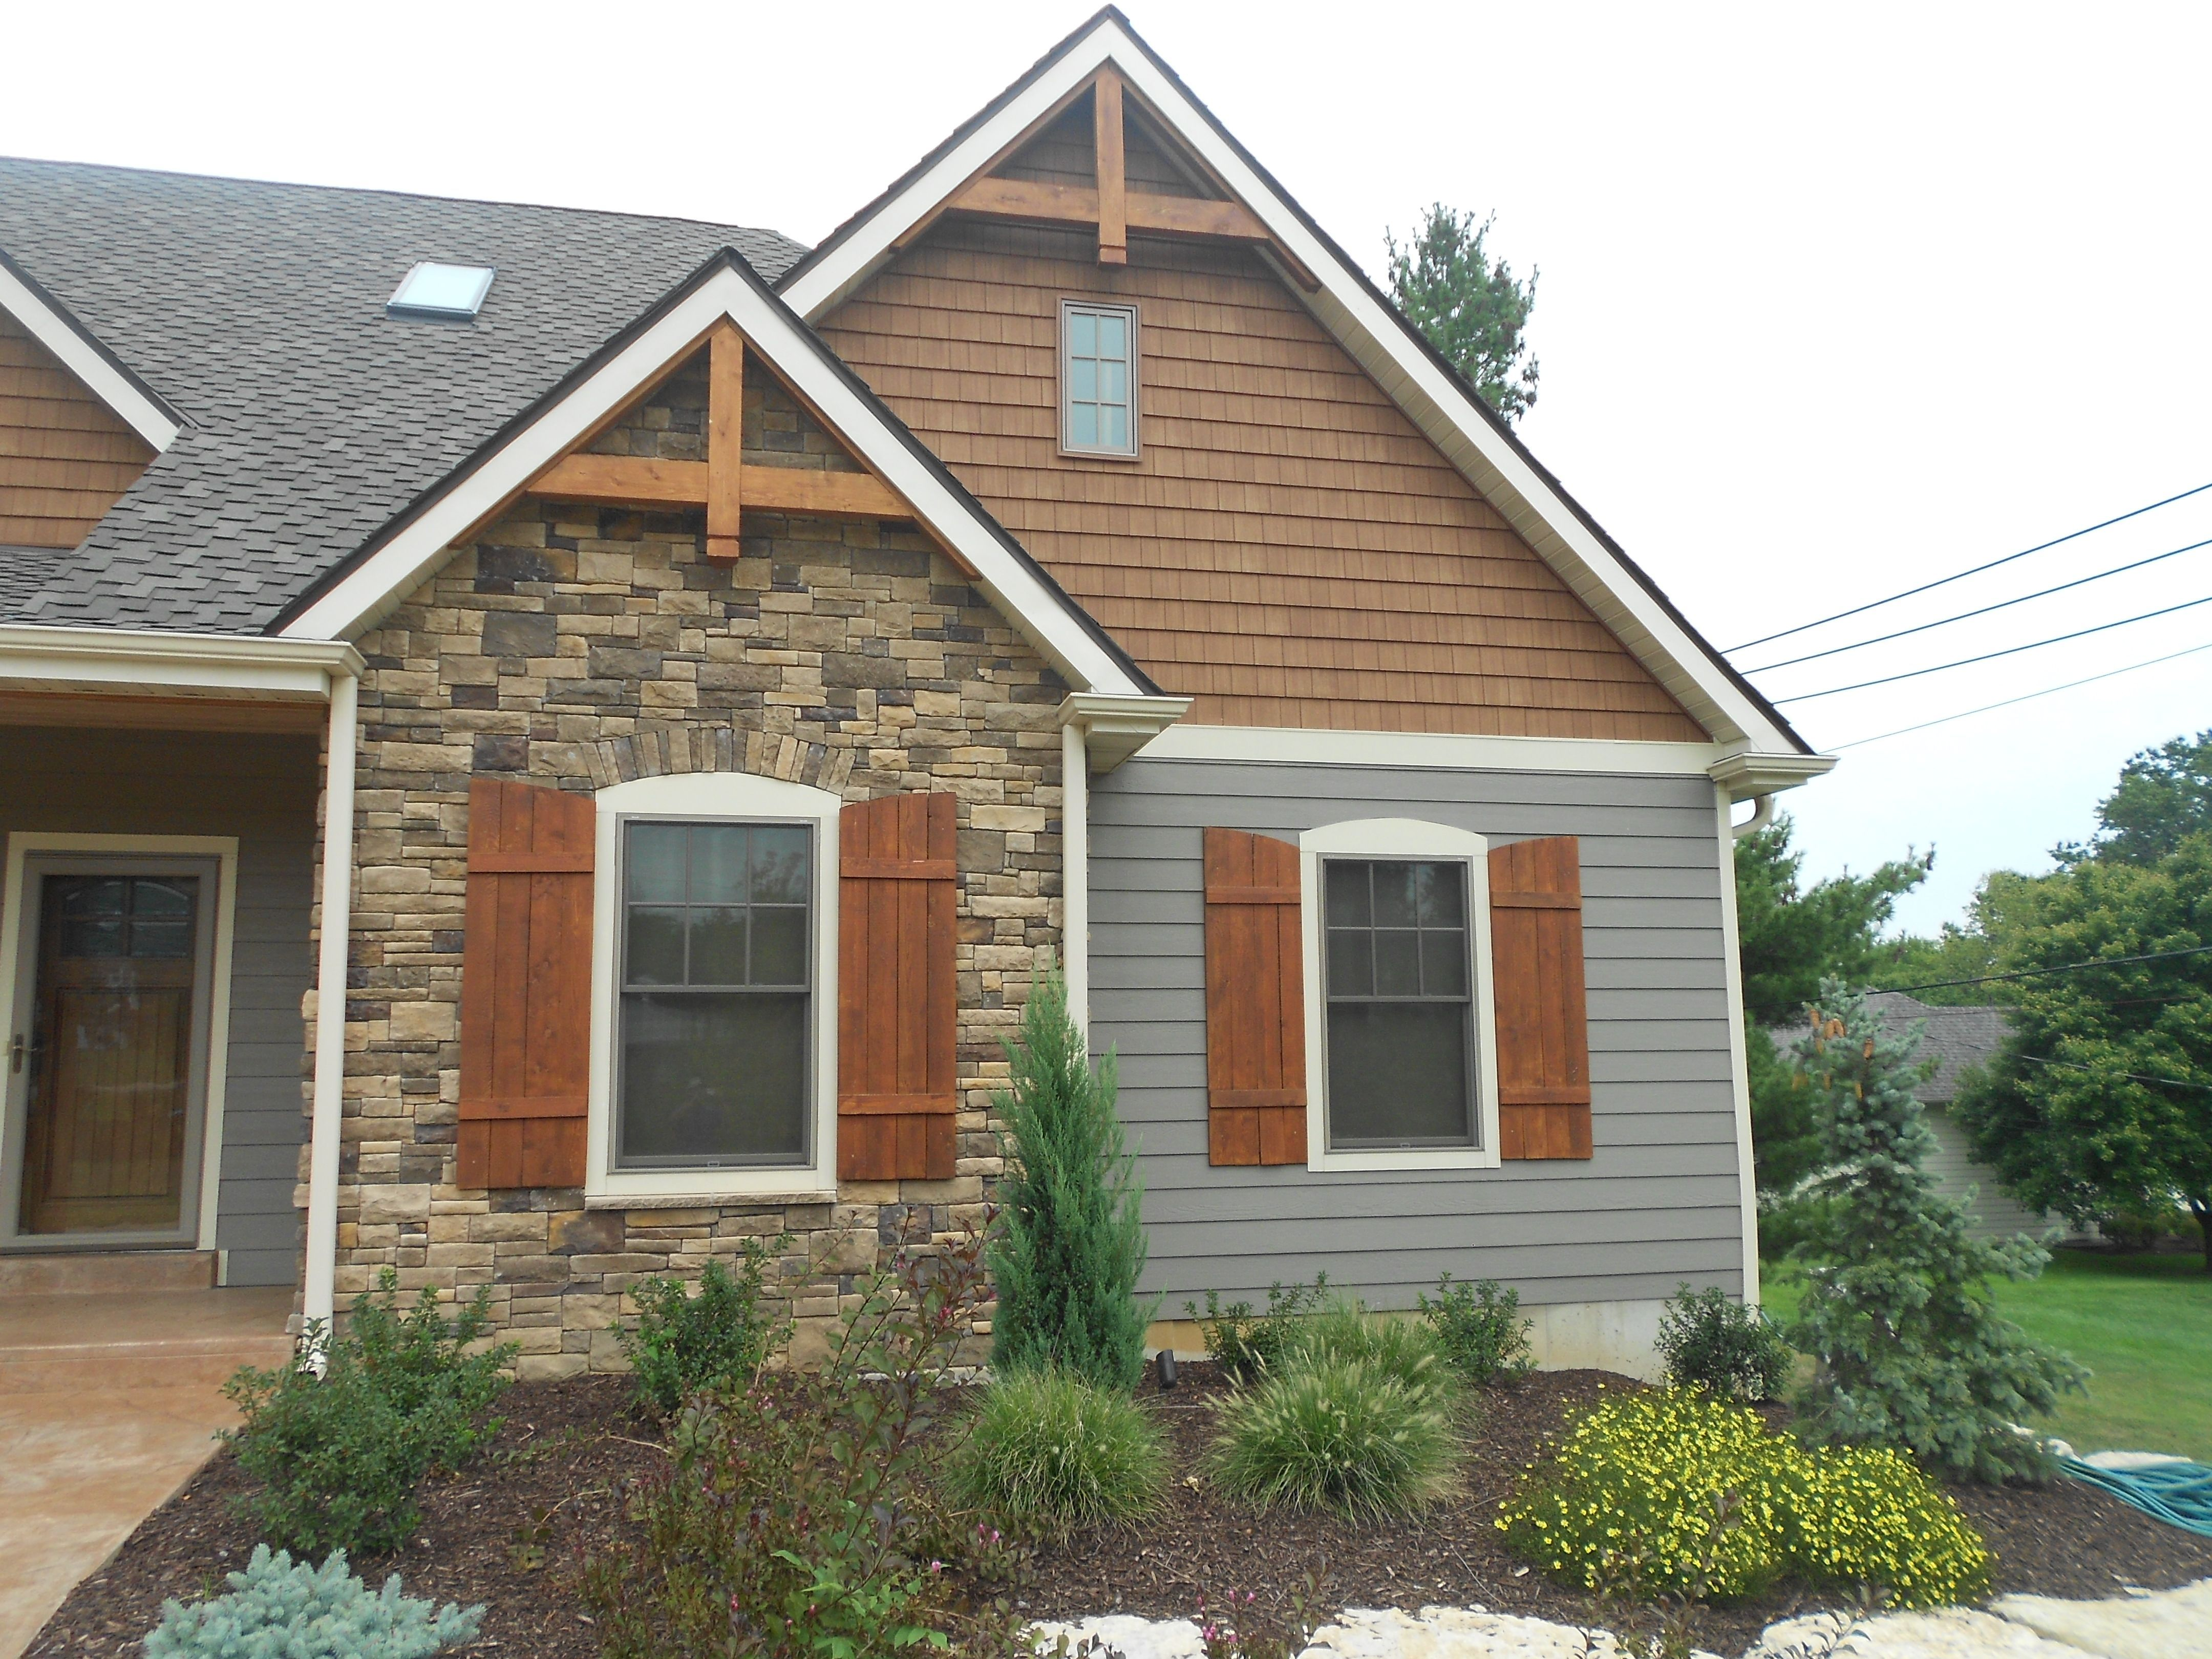 Image Result For Installing Cedar Siding On A Gable House Paint Exterior Outdoor Siding Vinyl Cedar Shake Siding